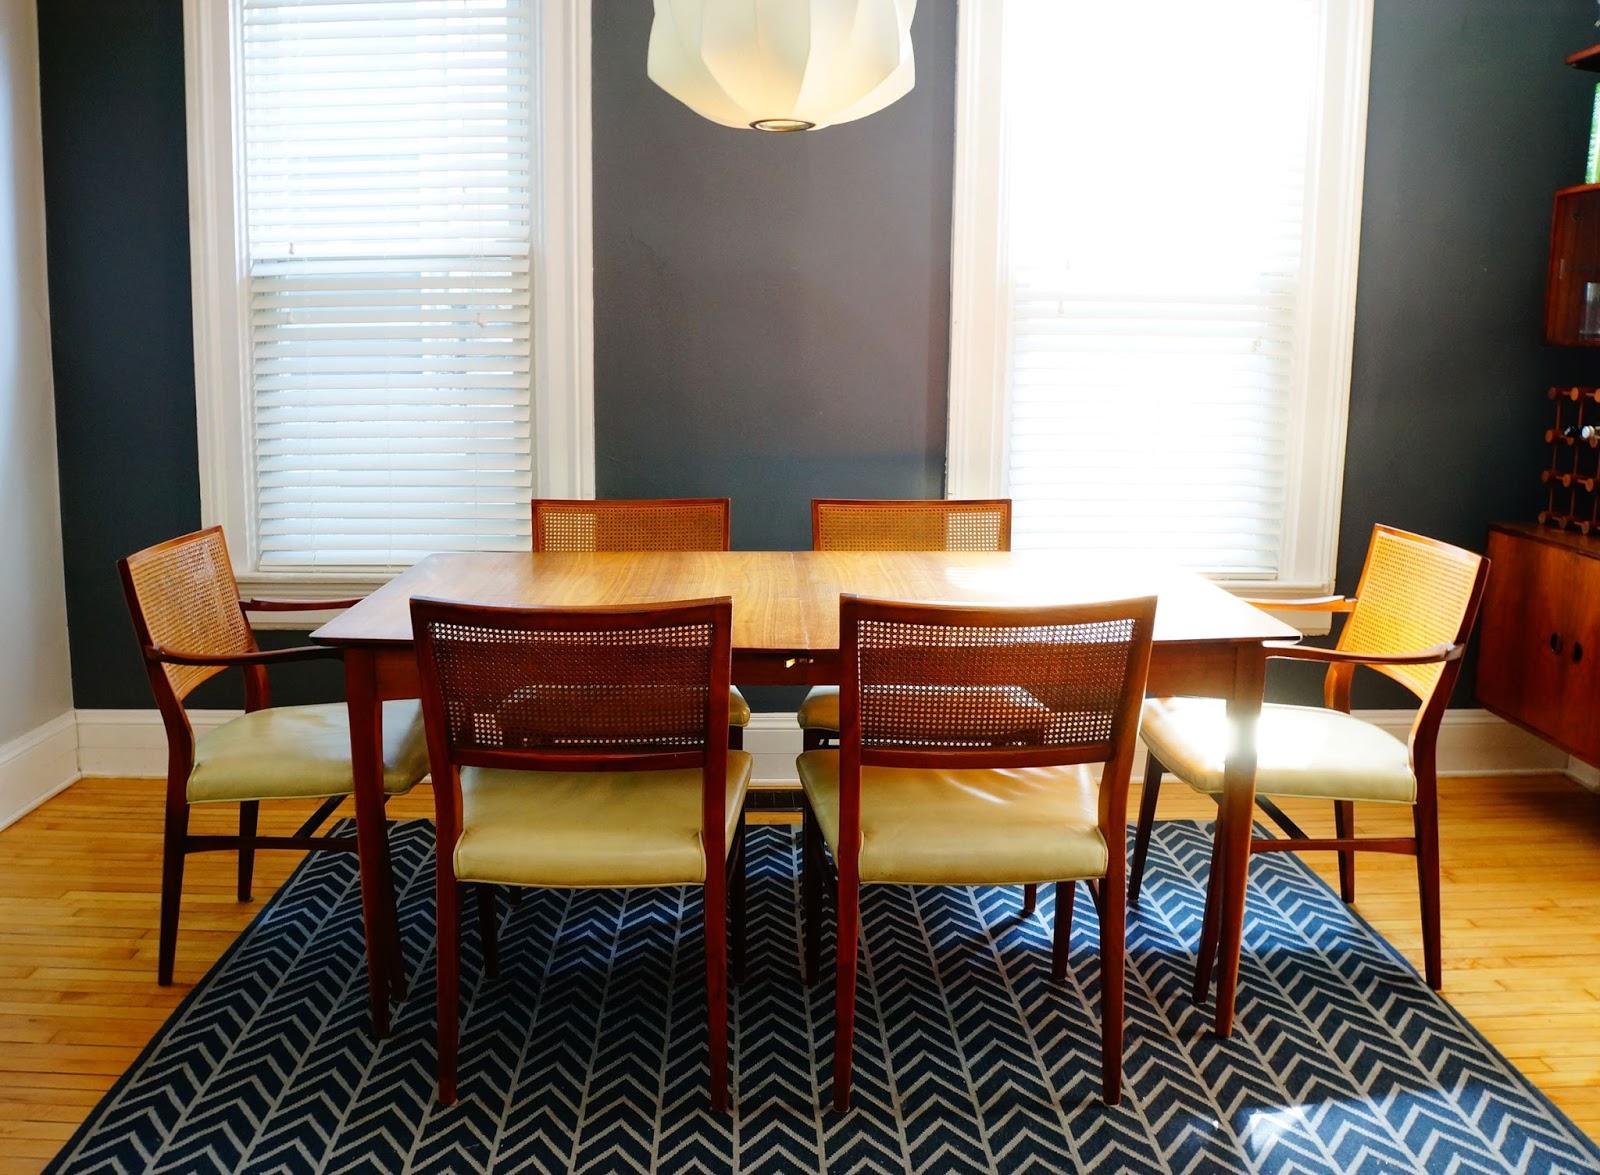 Midcentury modern dining